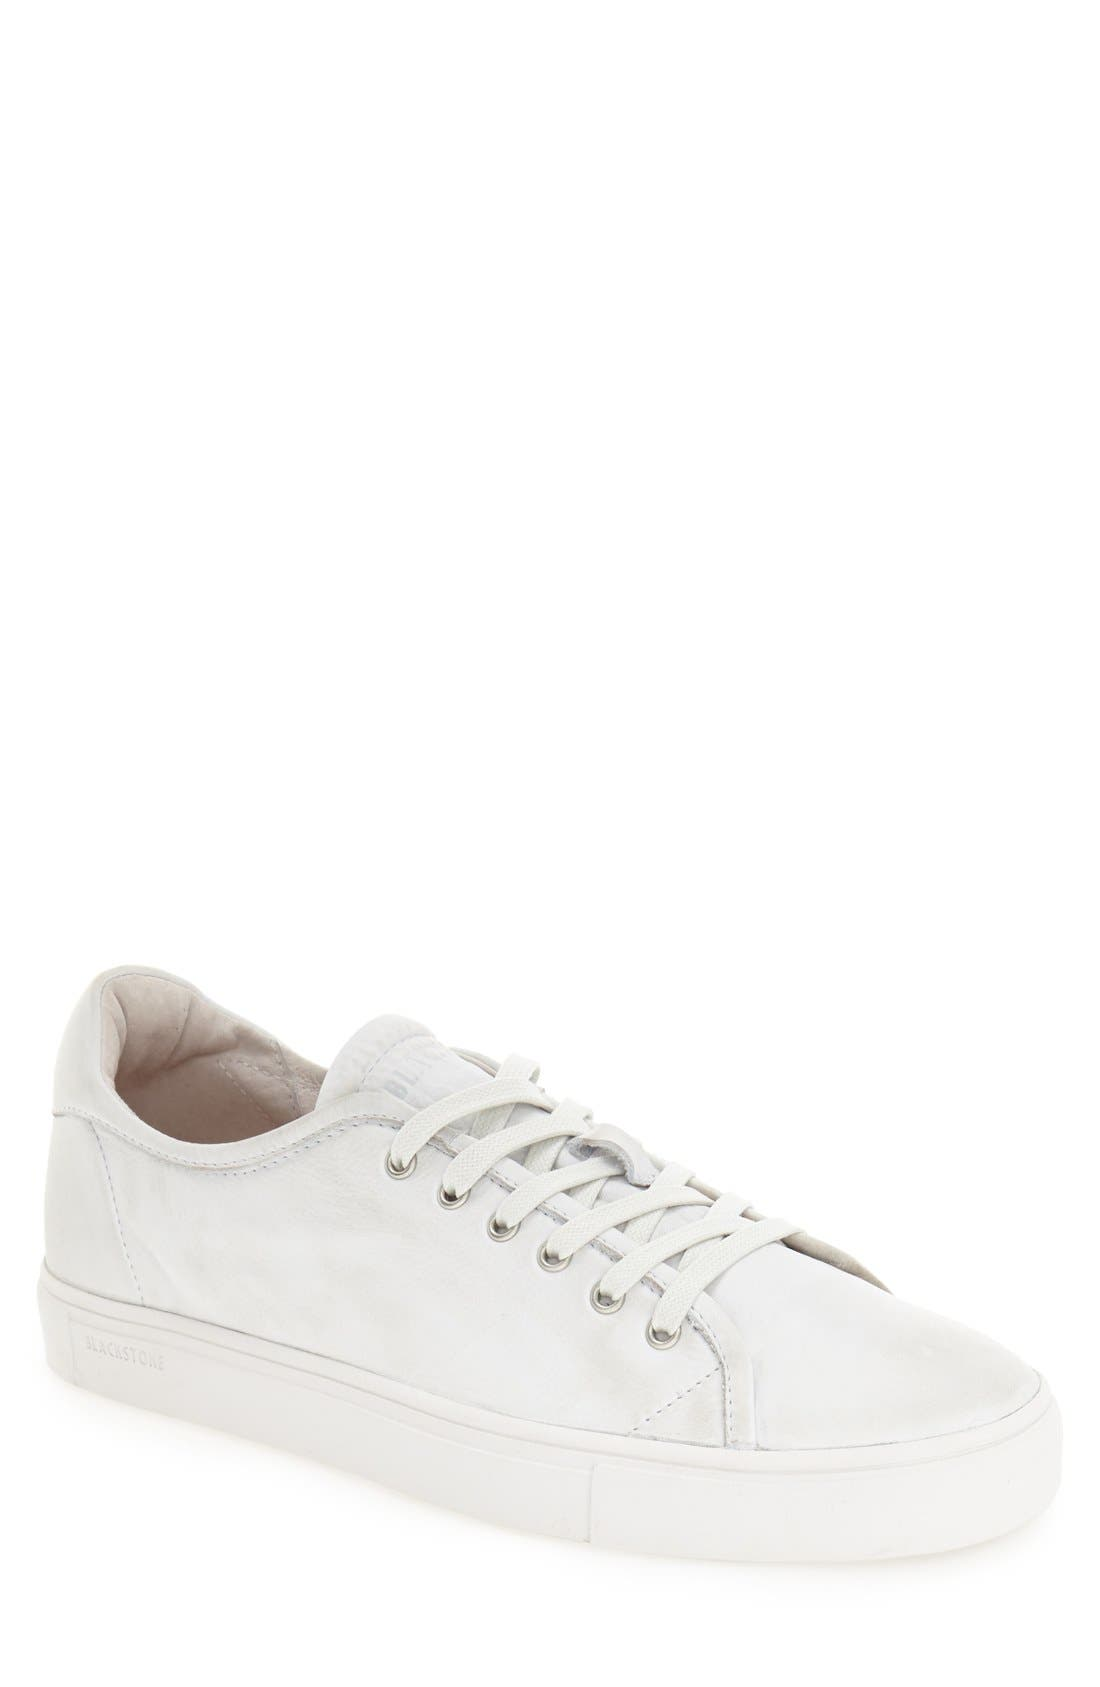 Blacktone 'LM24' Sneaker (Men)